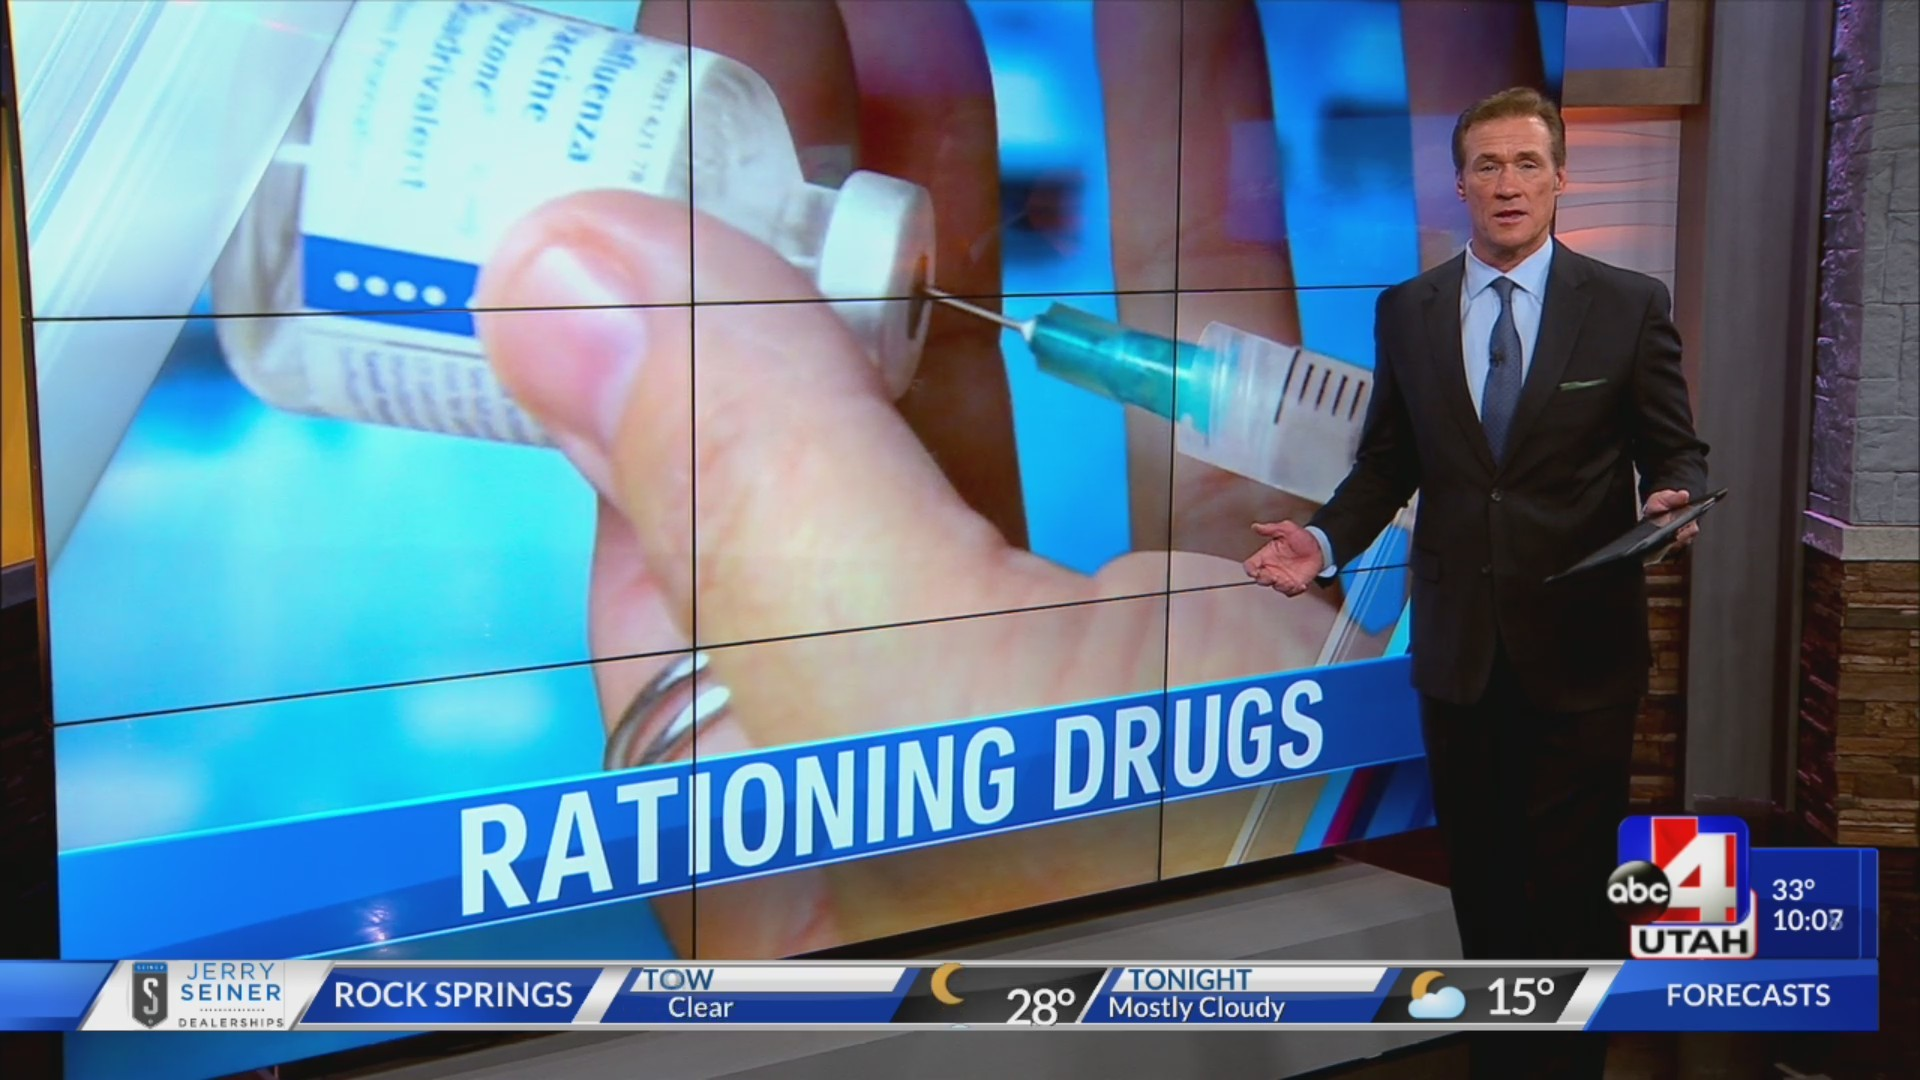 Rationing Drugs